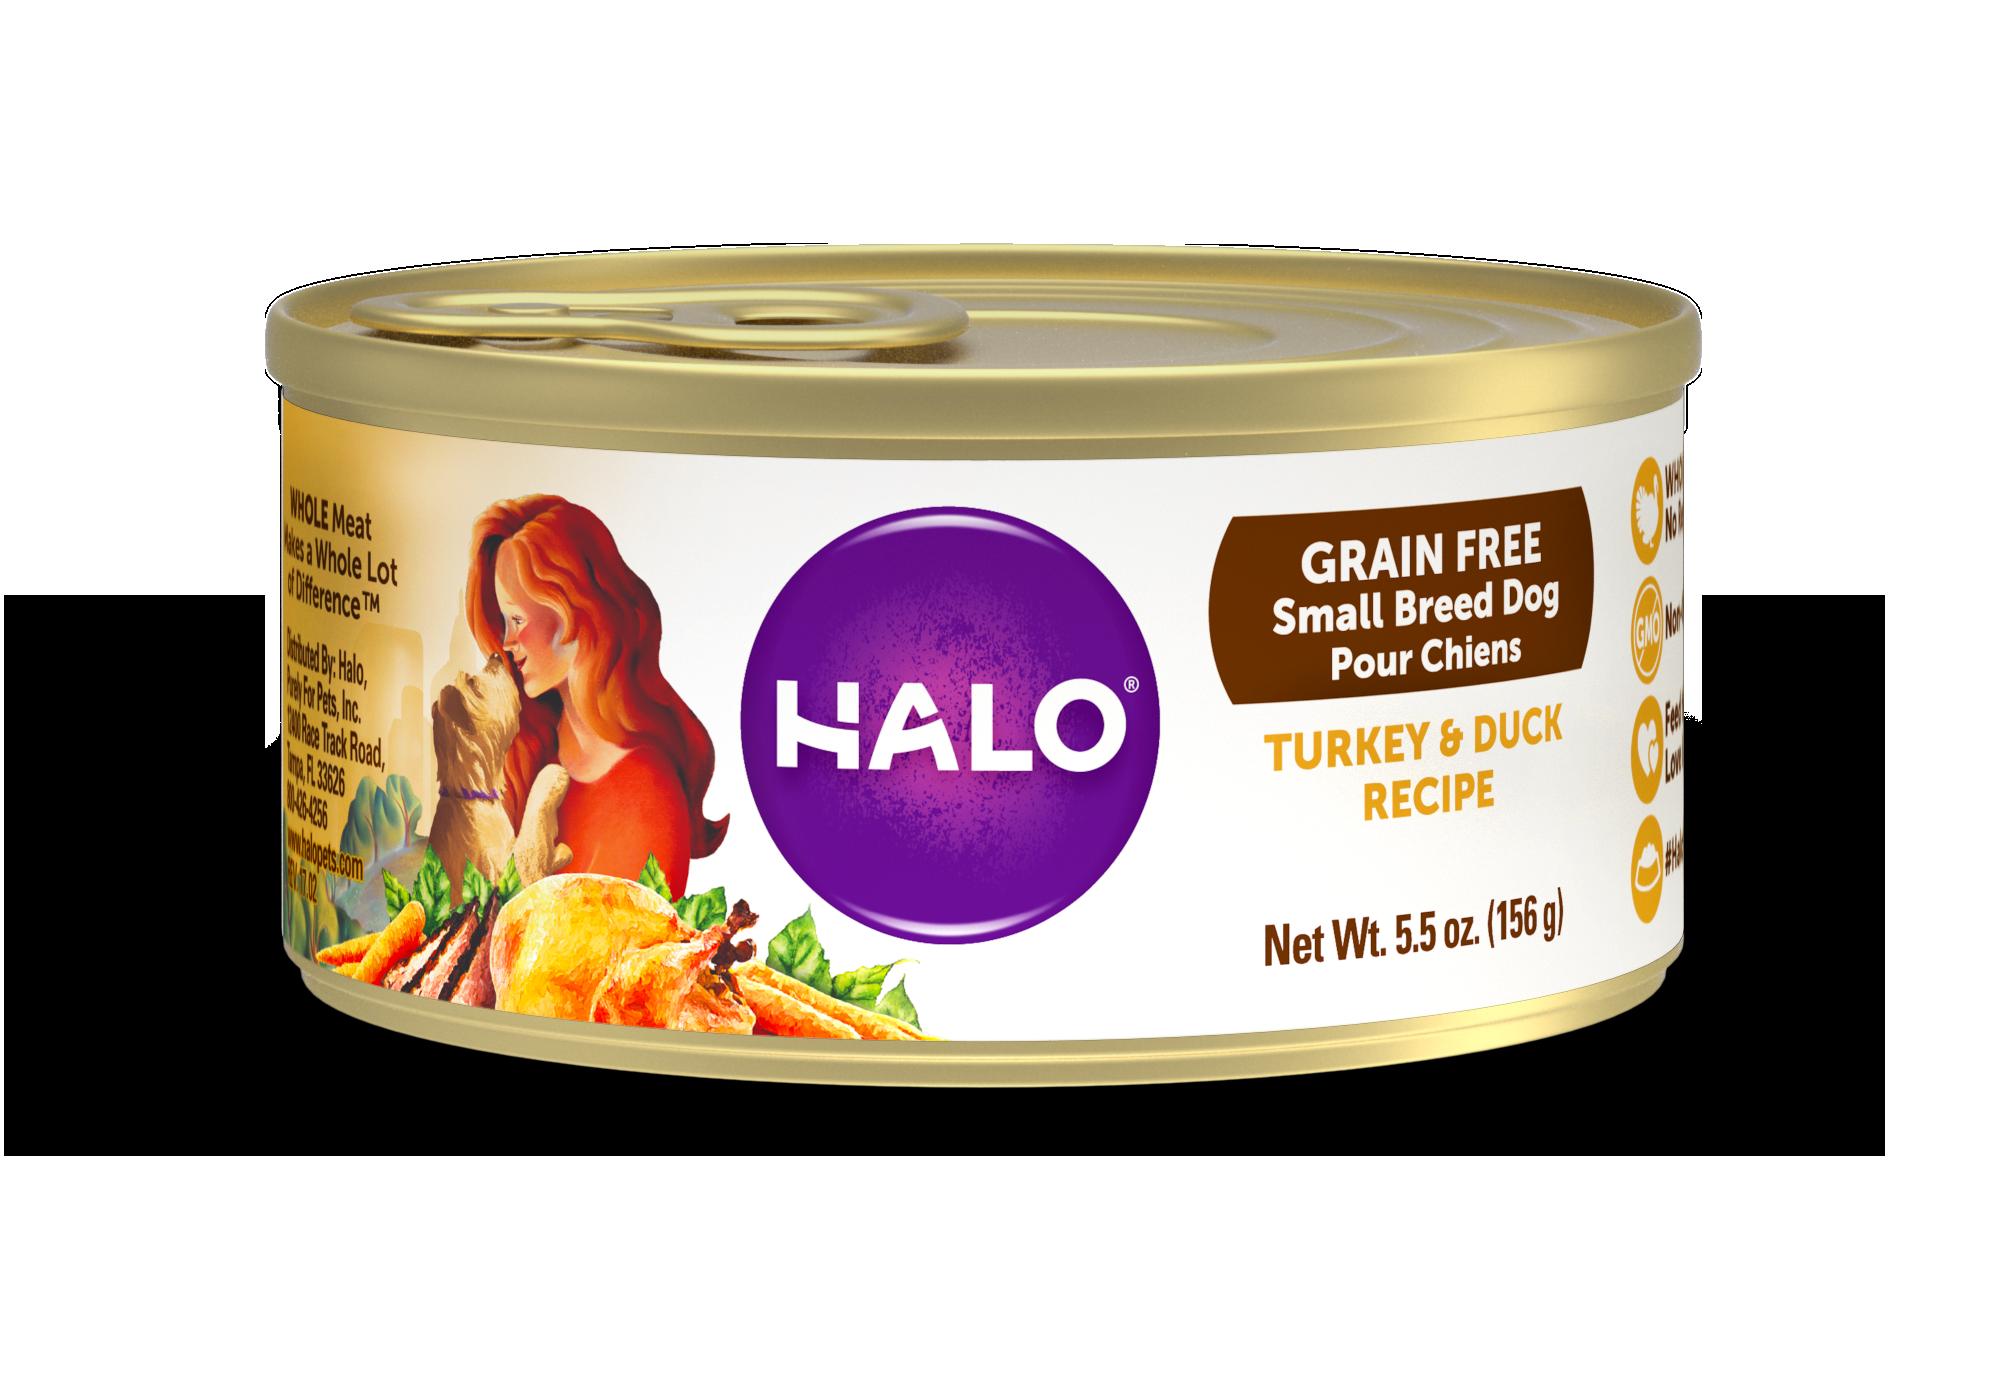 Grains clipart 5 food. Halo small breed grain